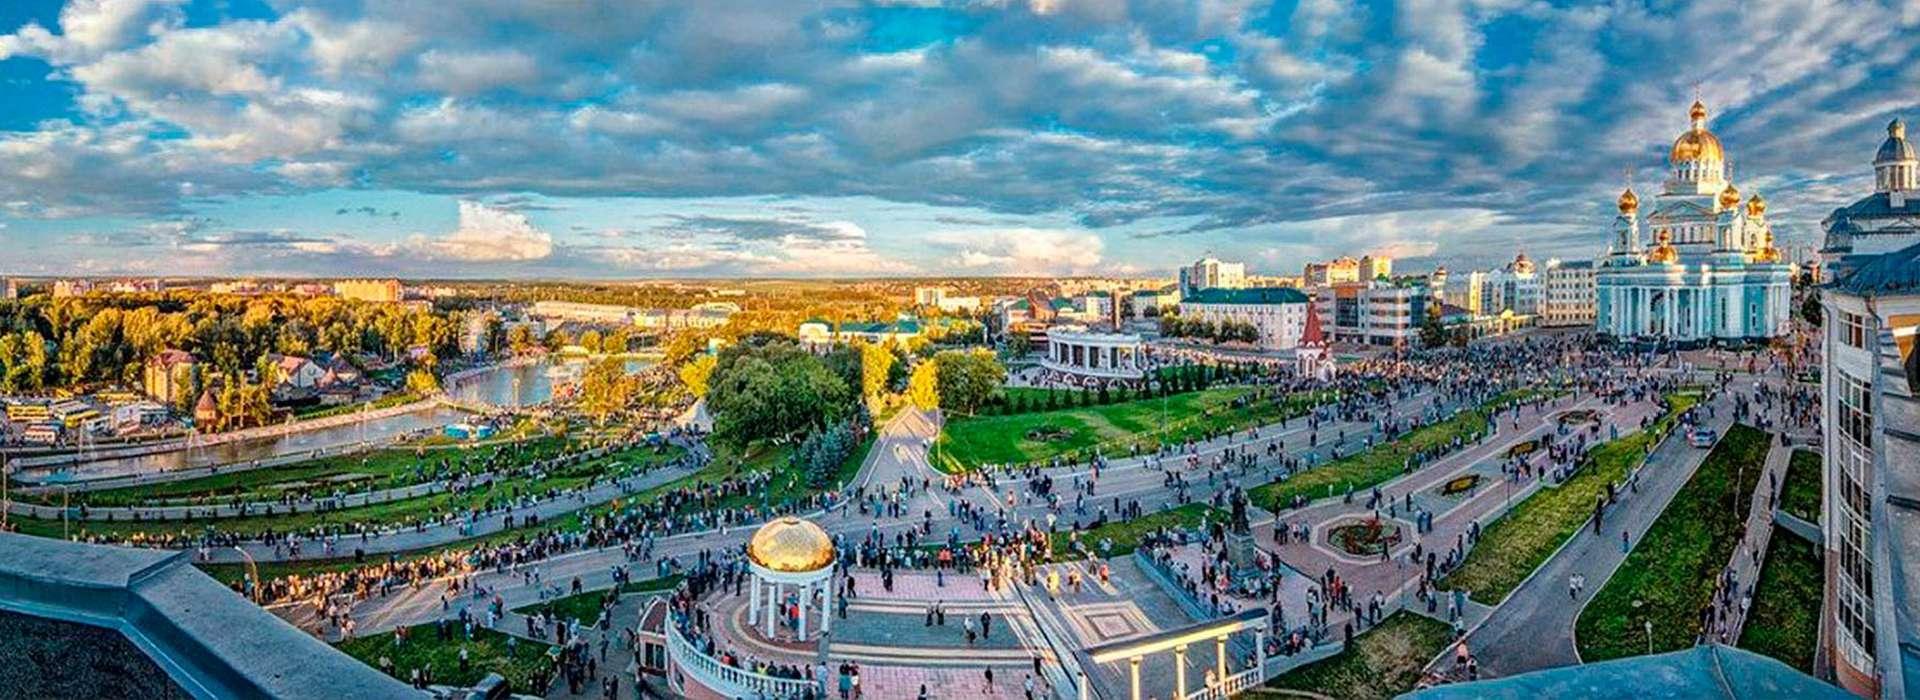 Саранск. Фото с сайта kidpassage.com